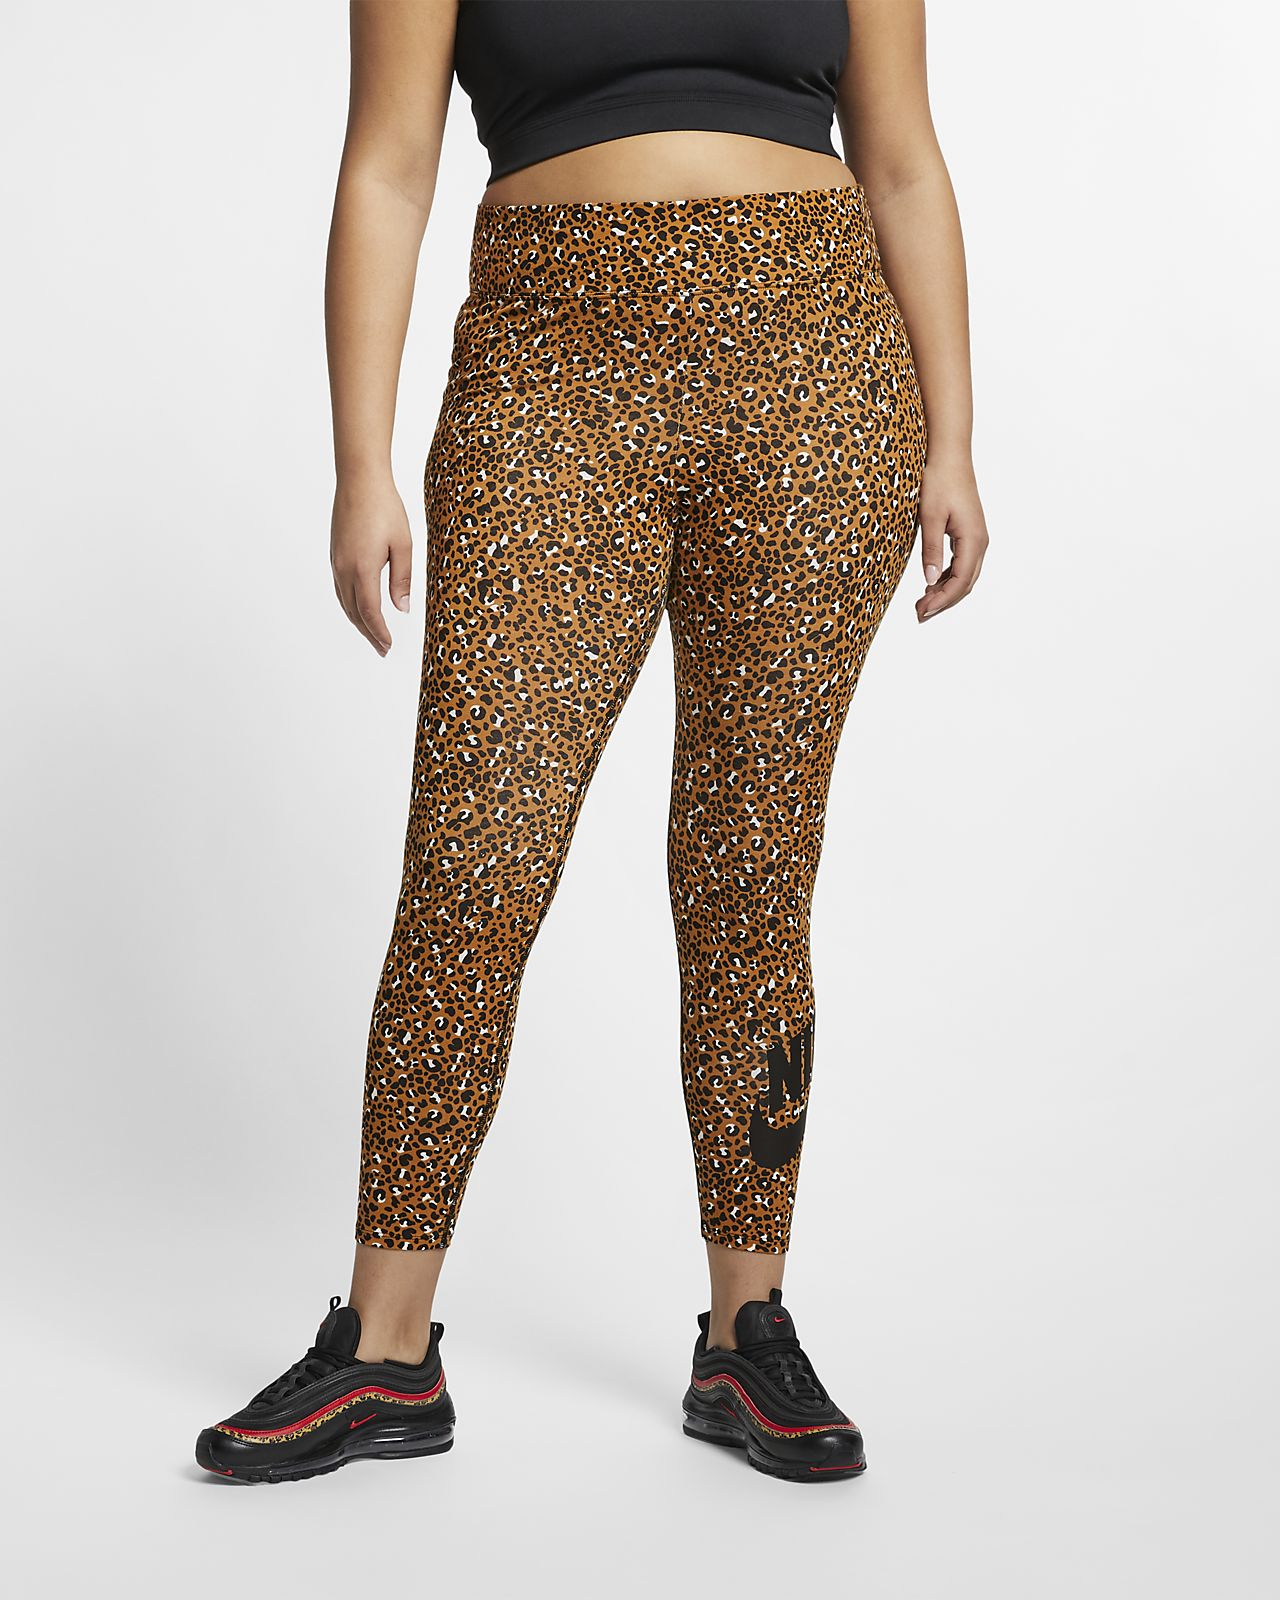 Leggings Nike Sportswear Animal Print para mulher (tamanhos grandes)